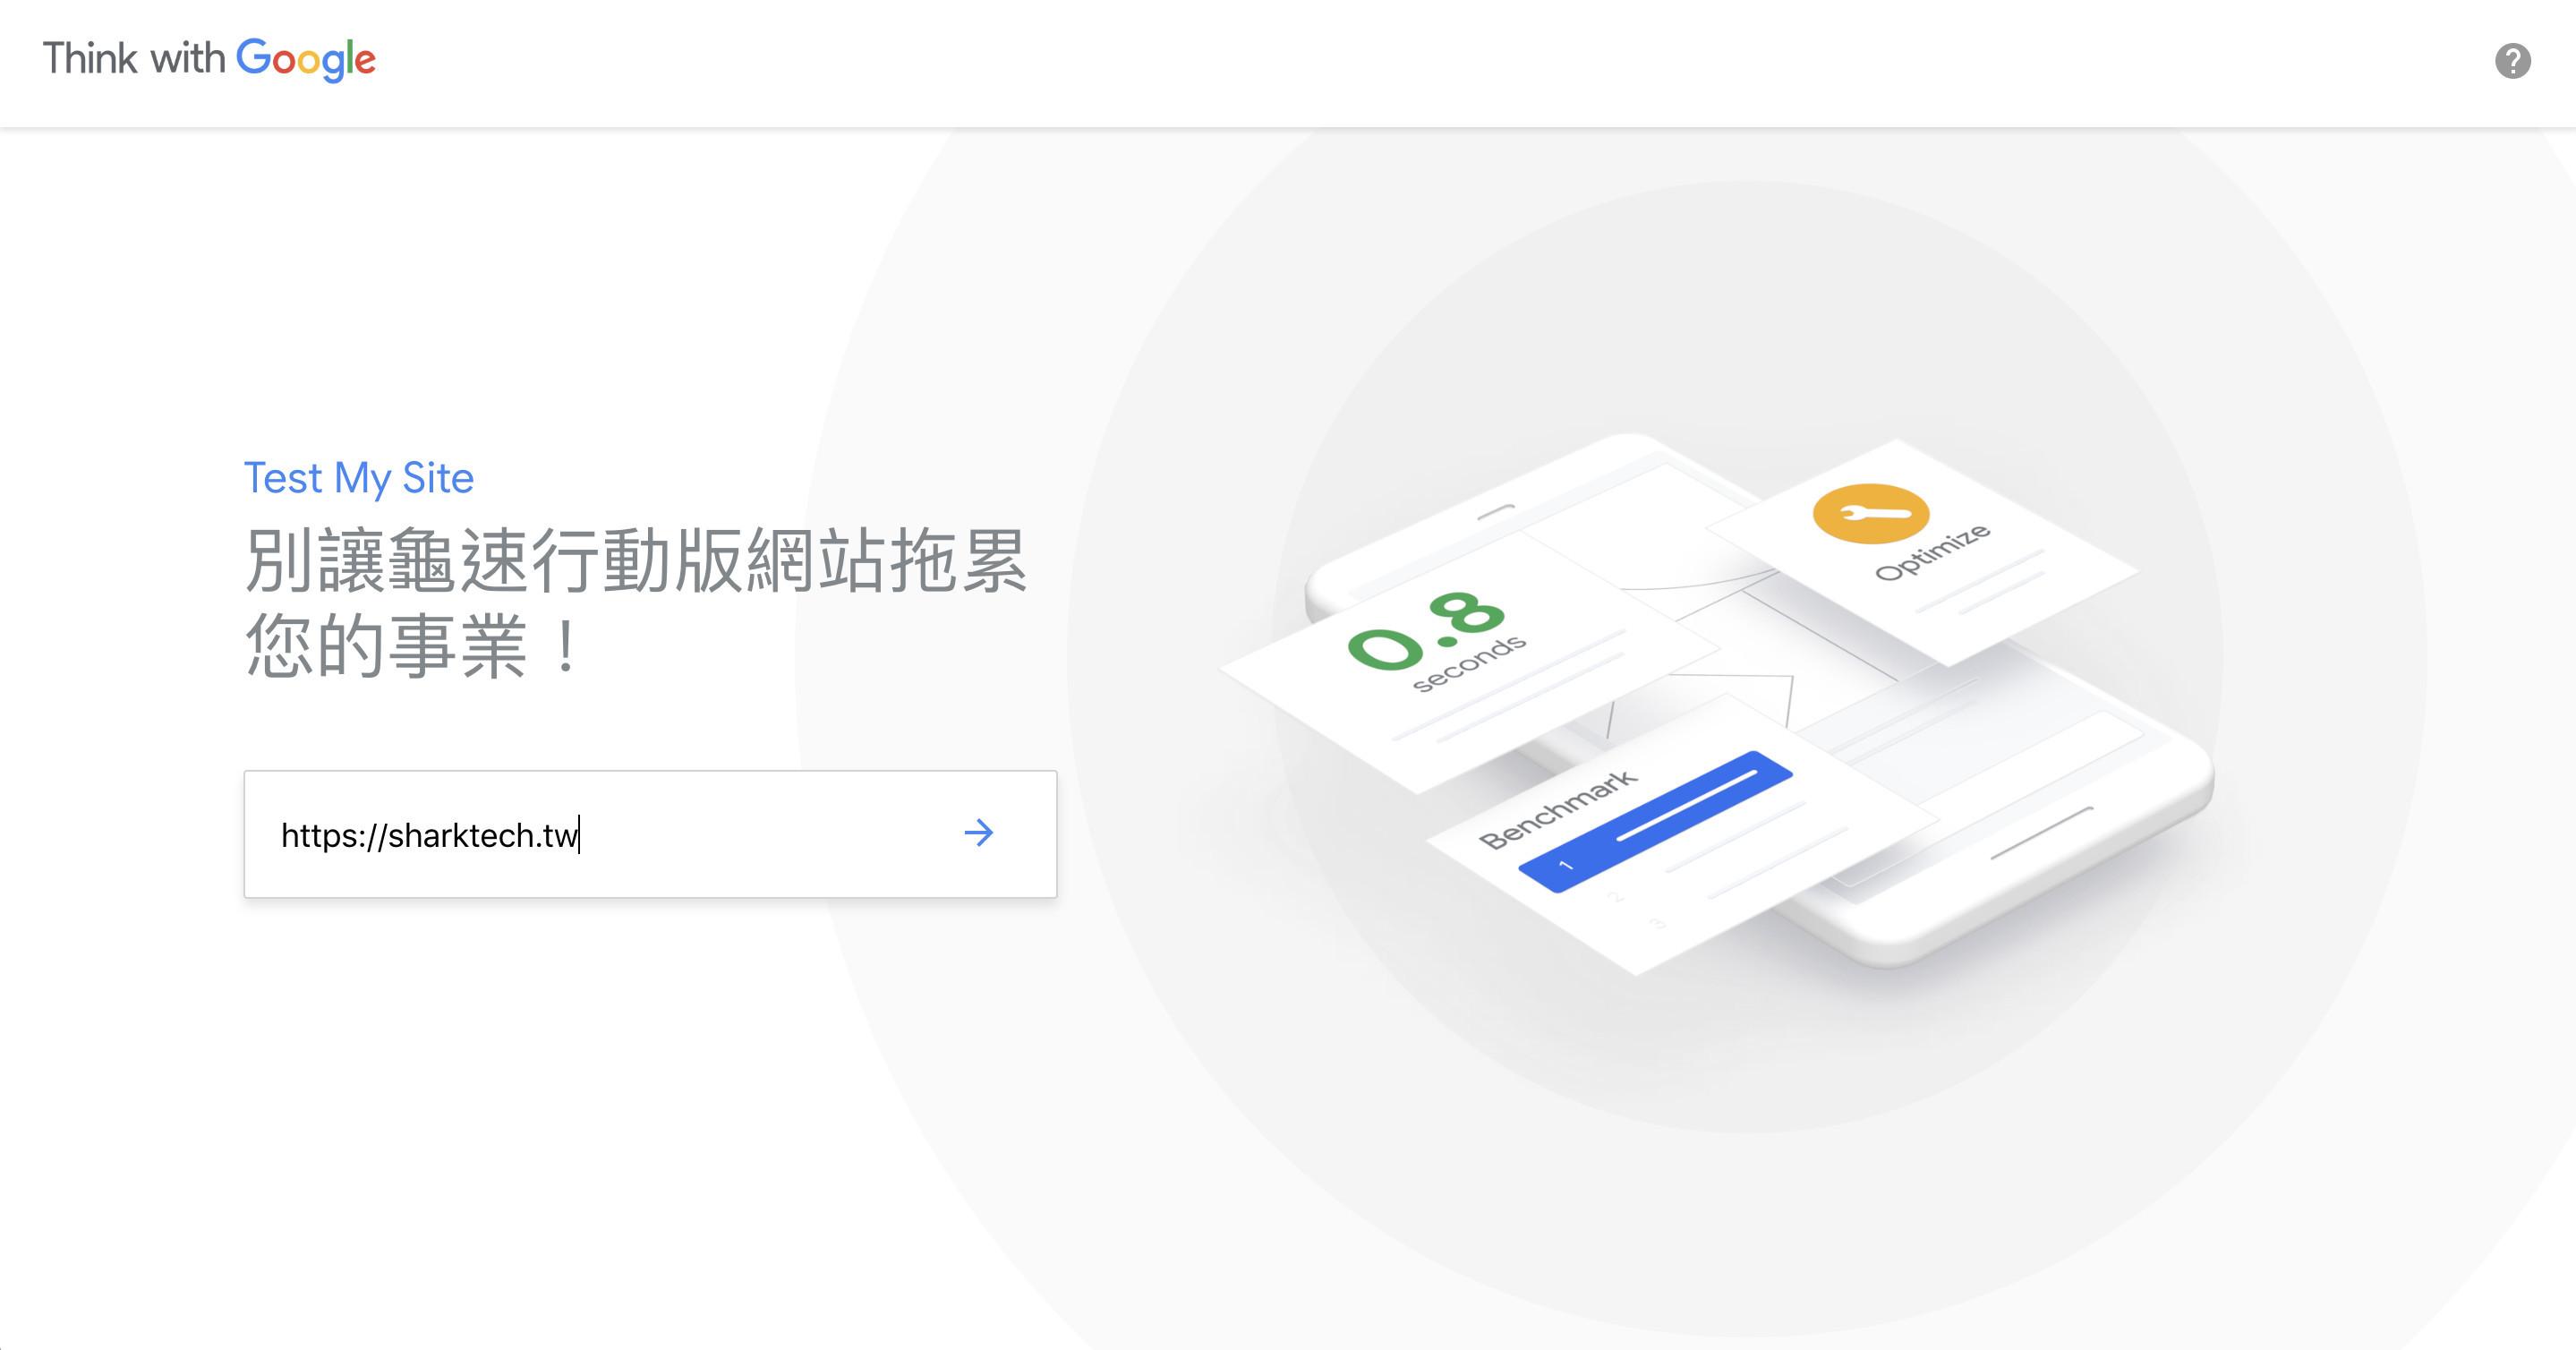 Google Test My Site行動網站載入速度檢測工具-鯊客科技SEO優化顧問公司